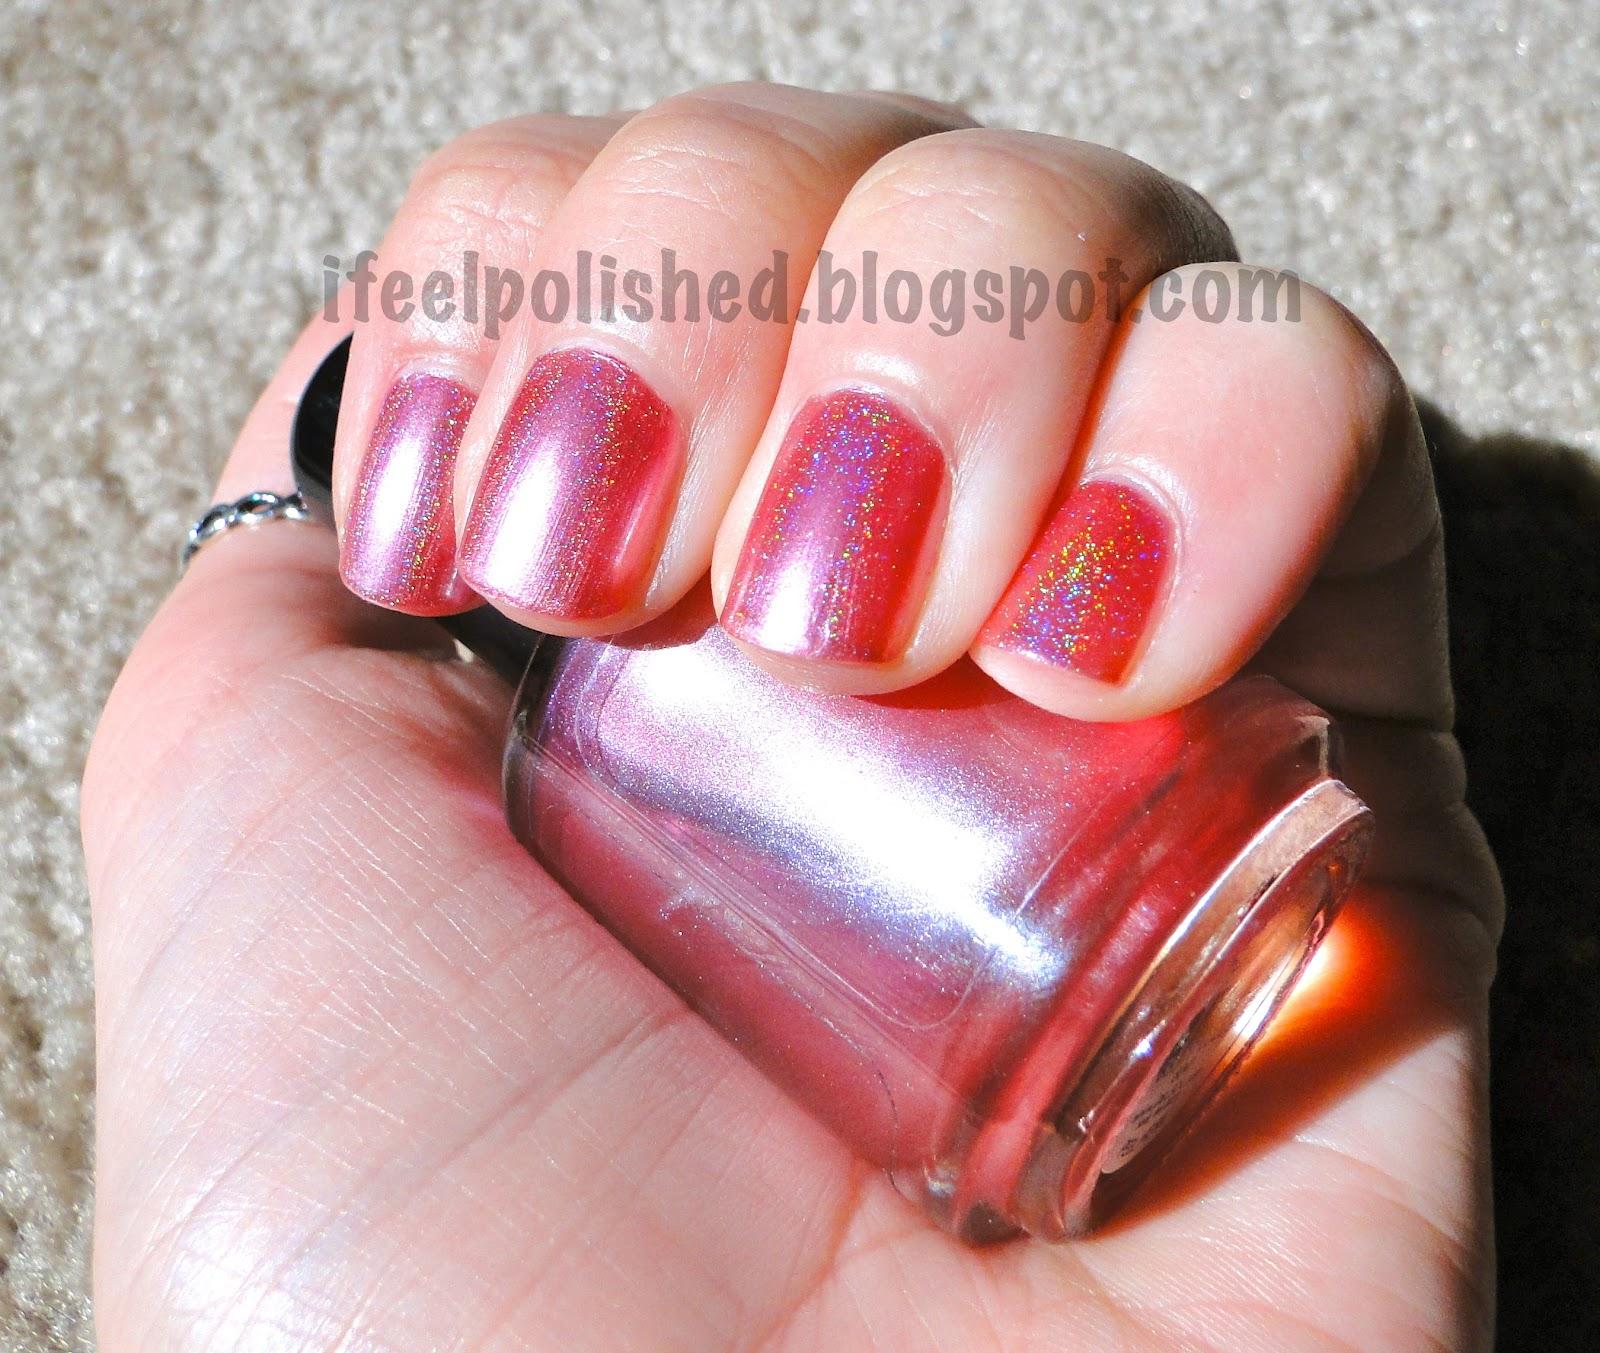 I Feel Polished!: Color Changing Holo